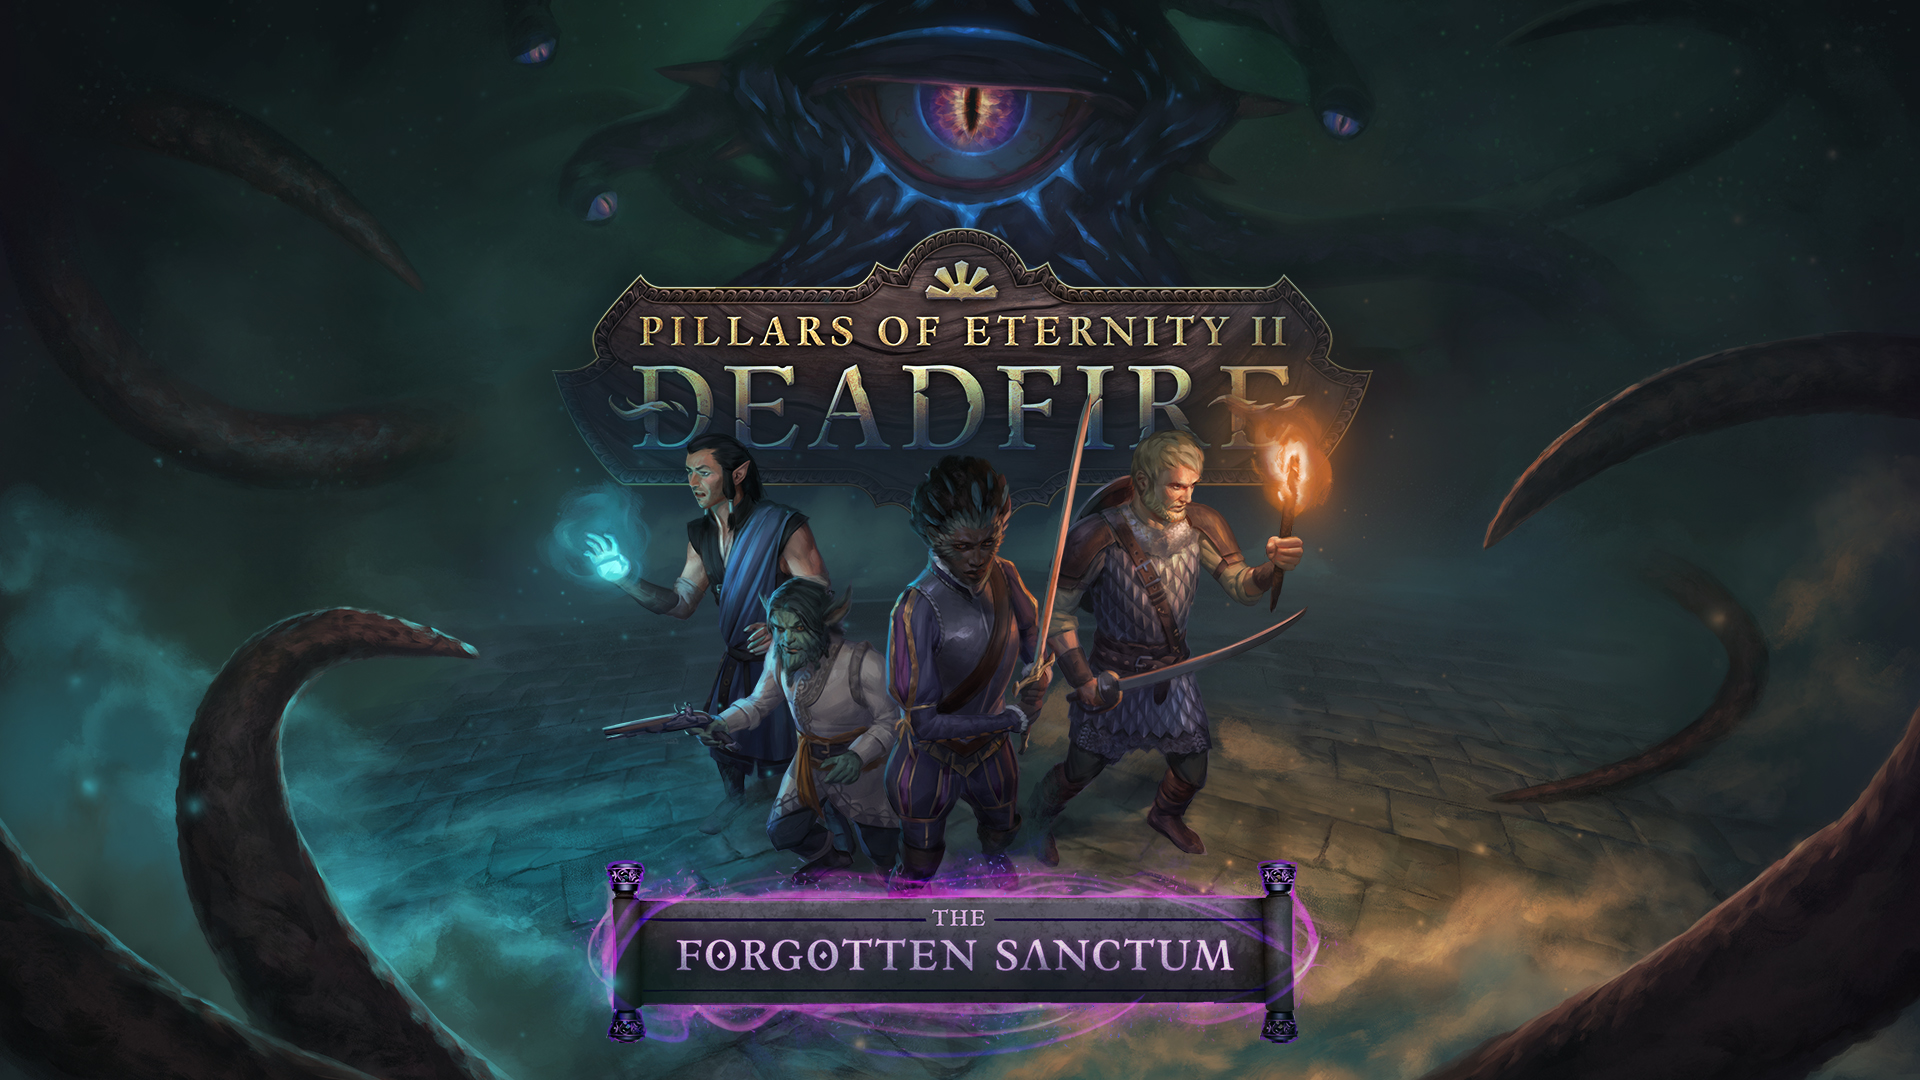 visuel de Pillars of Eternity 2: Deadfire, The Forgotten Sanctum